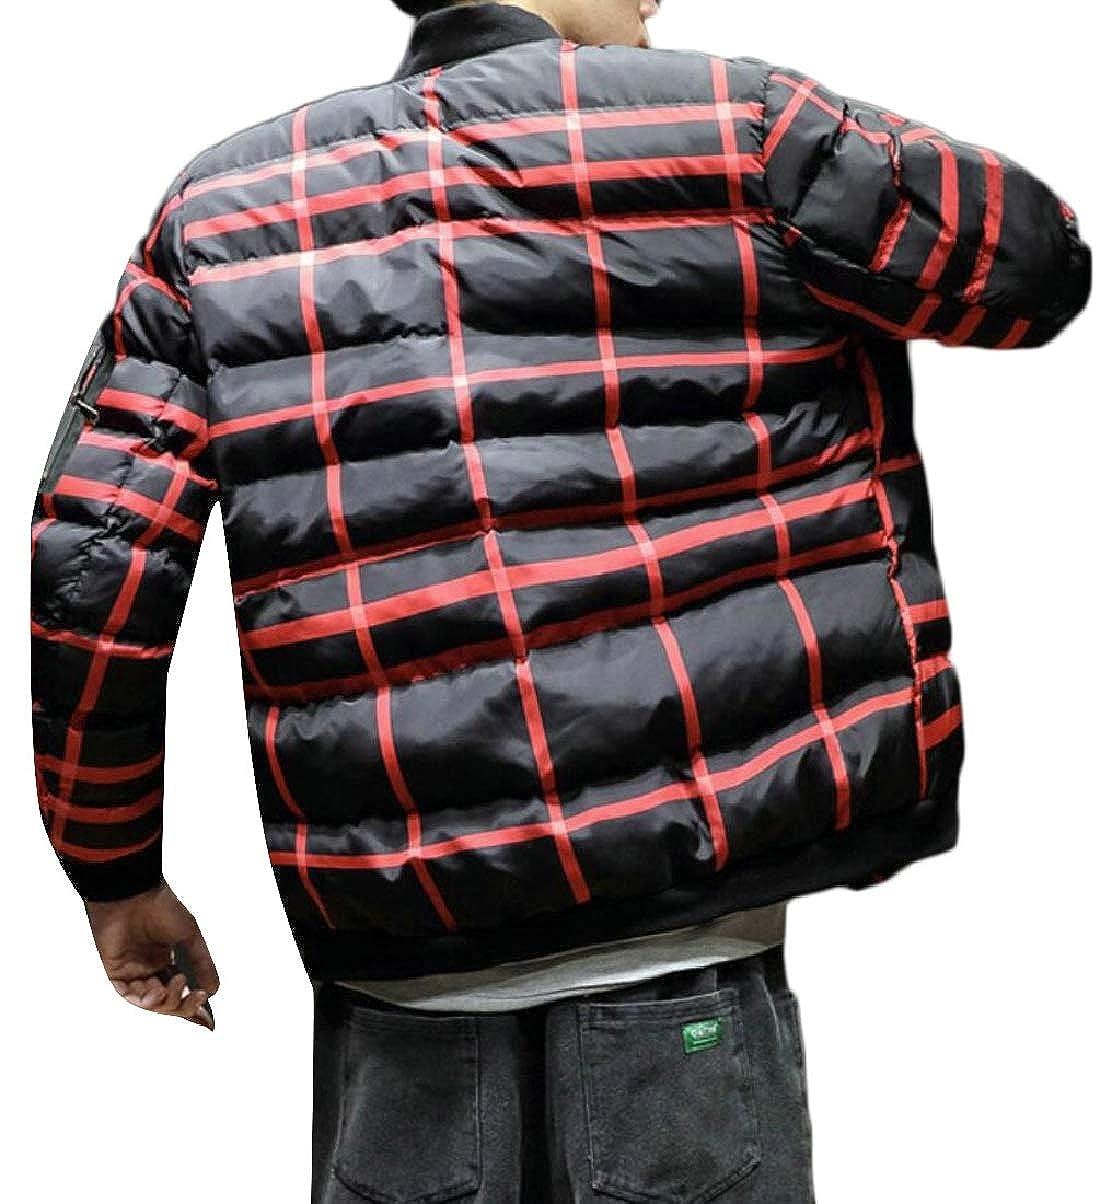 ZXFHZS Mens Winter Oversize Padded Stylish Plaid Thick Down Jacket Coat